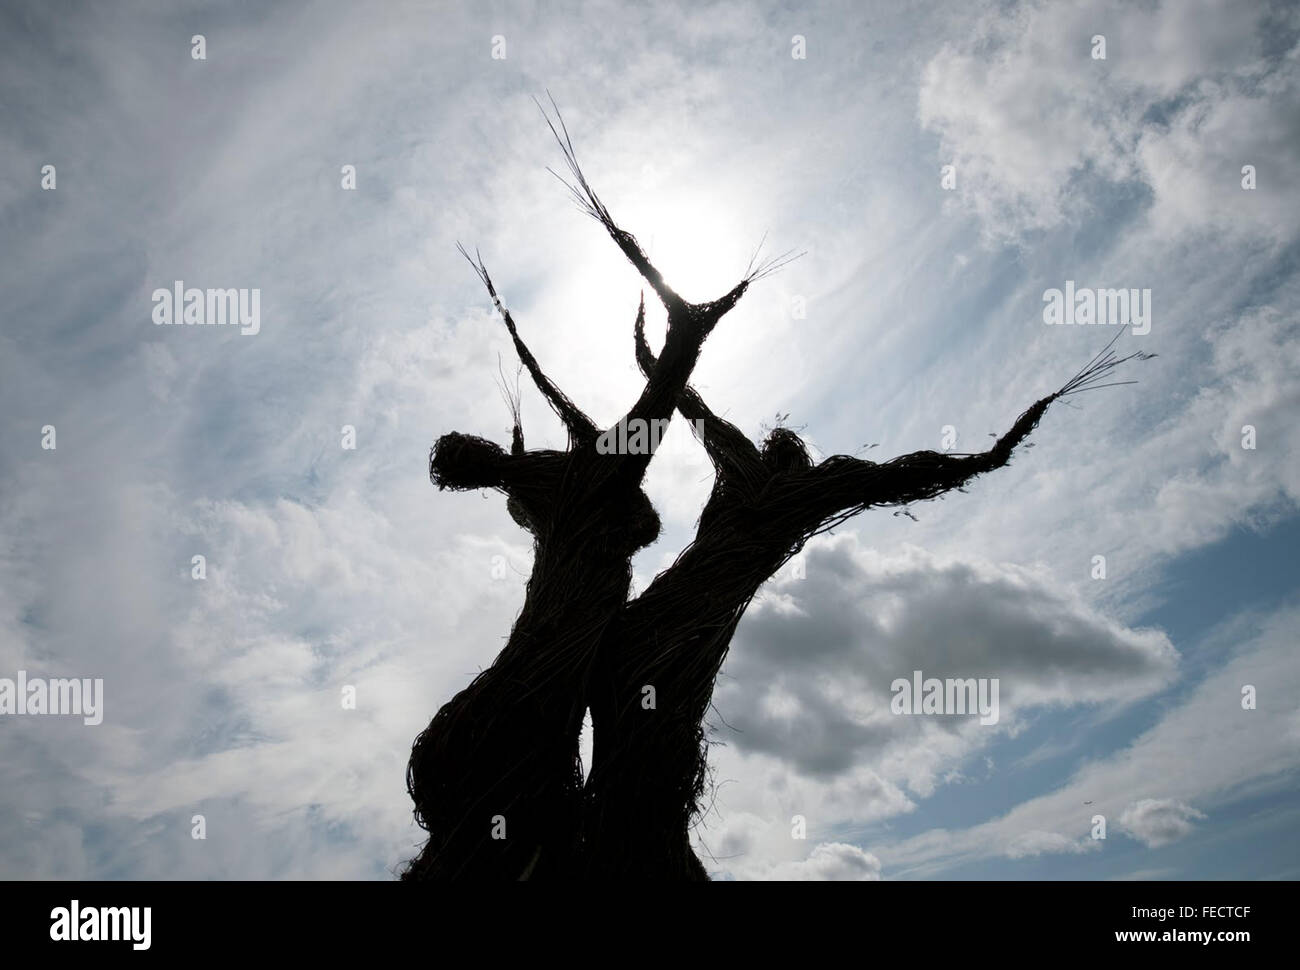 THE WICKER TREE (2011) ROBIN HARDY (DIR) MOVIESTORE COLLECTION LTD - Stock Image